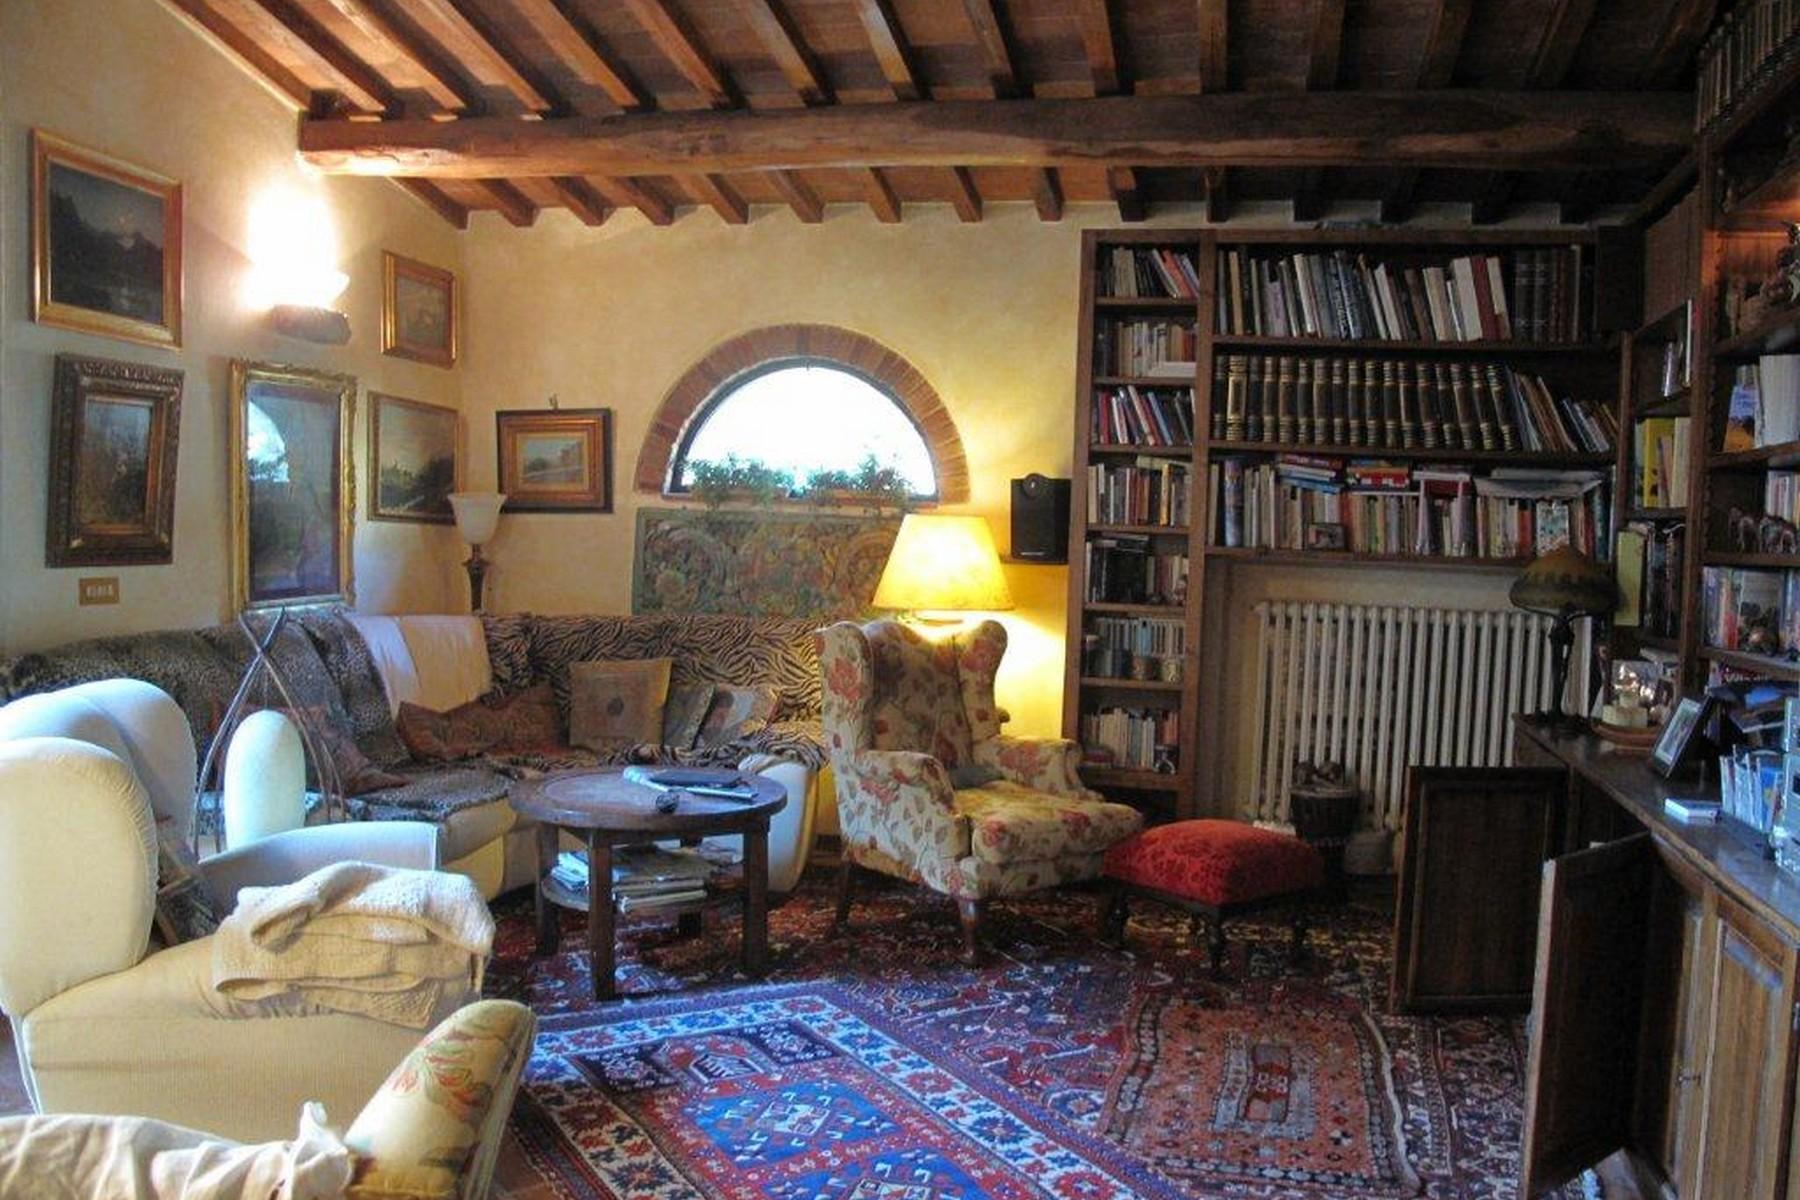 Villa in Vendita a Greve In Chianti: 5 locali, 400 mq - Foto 3